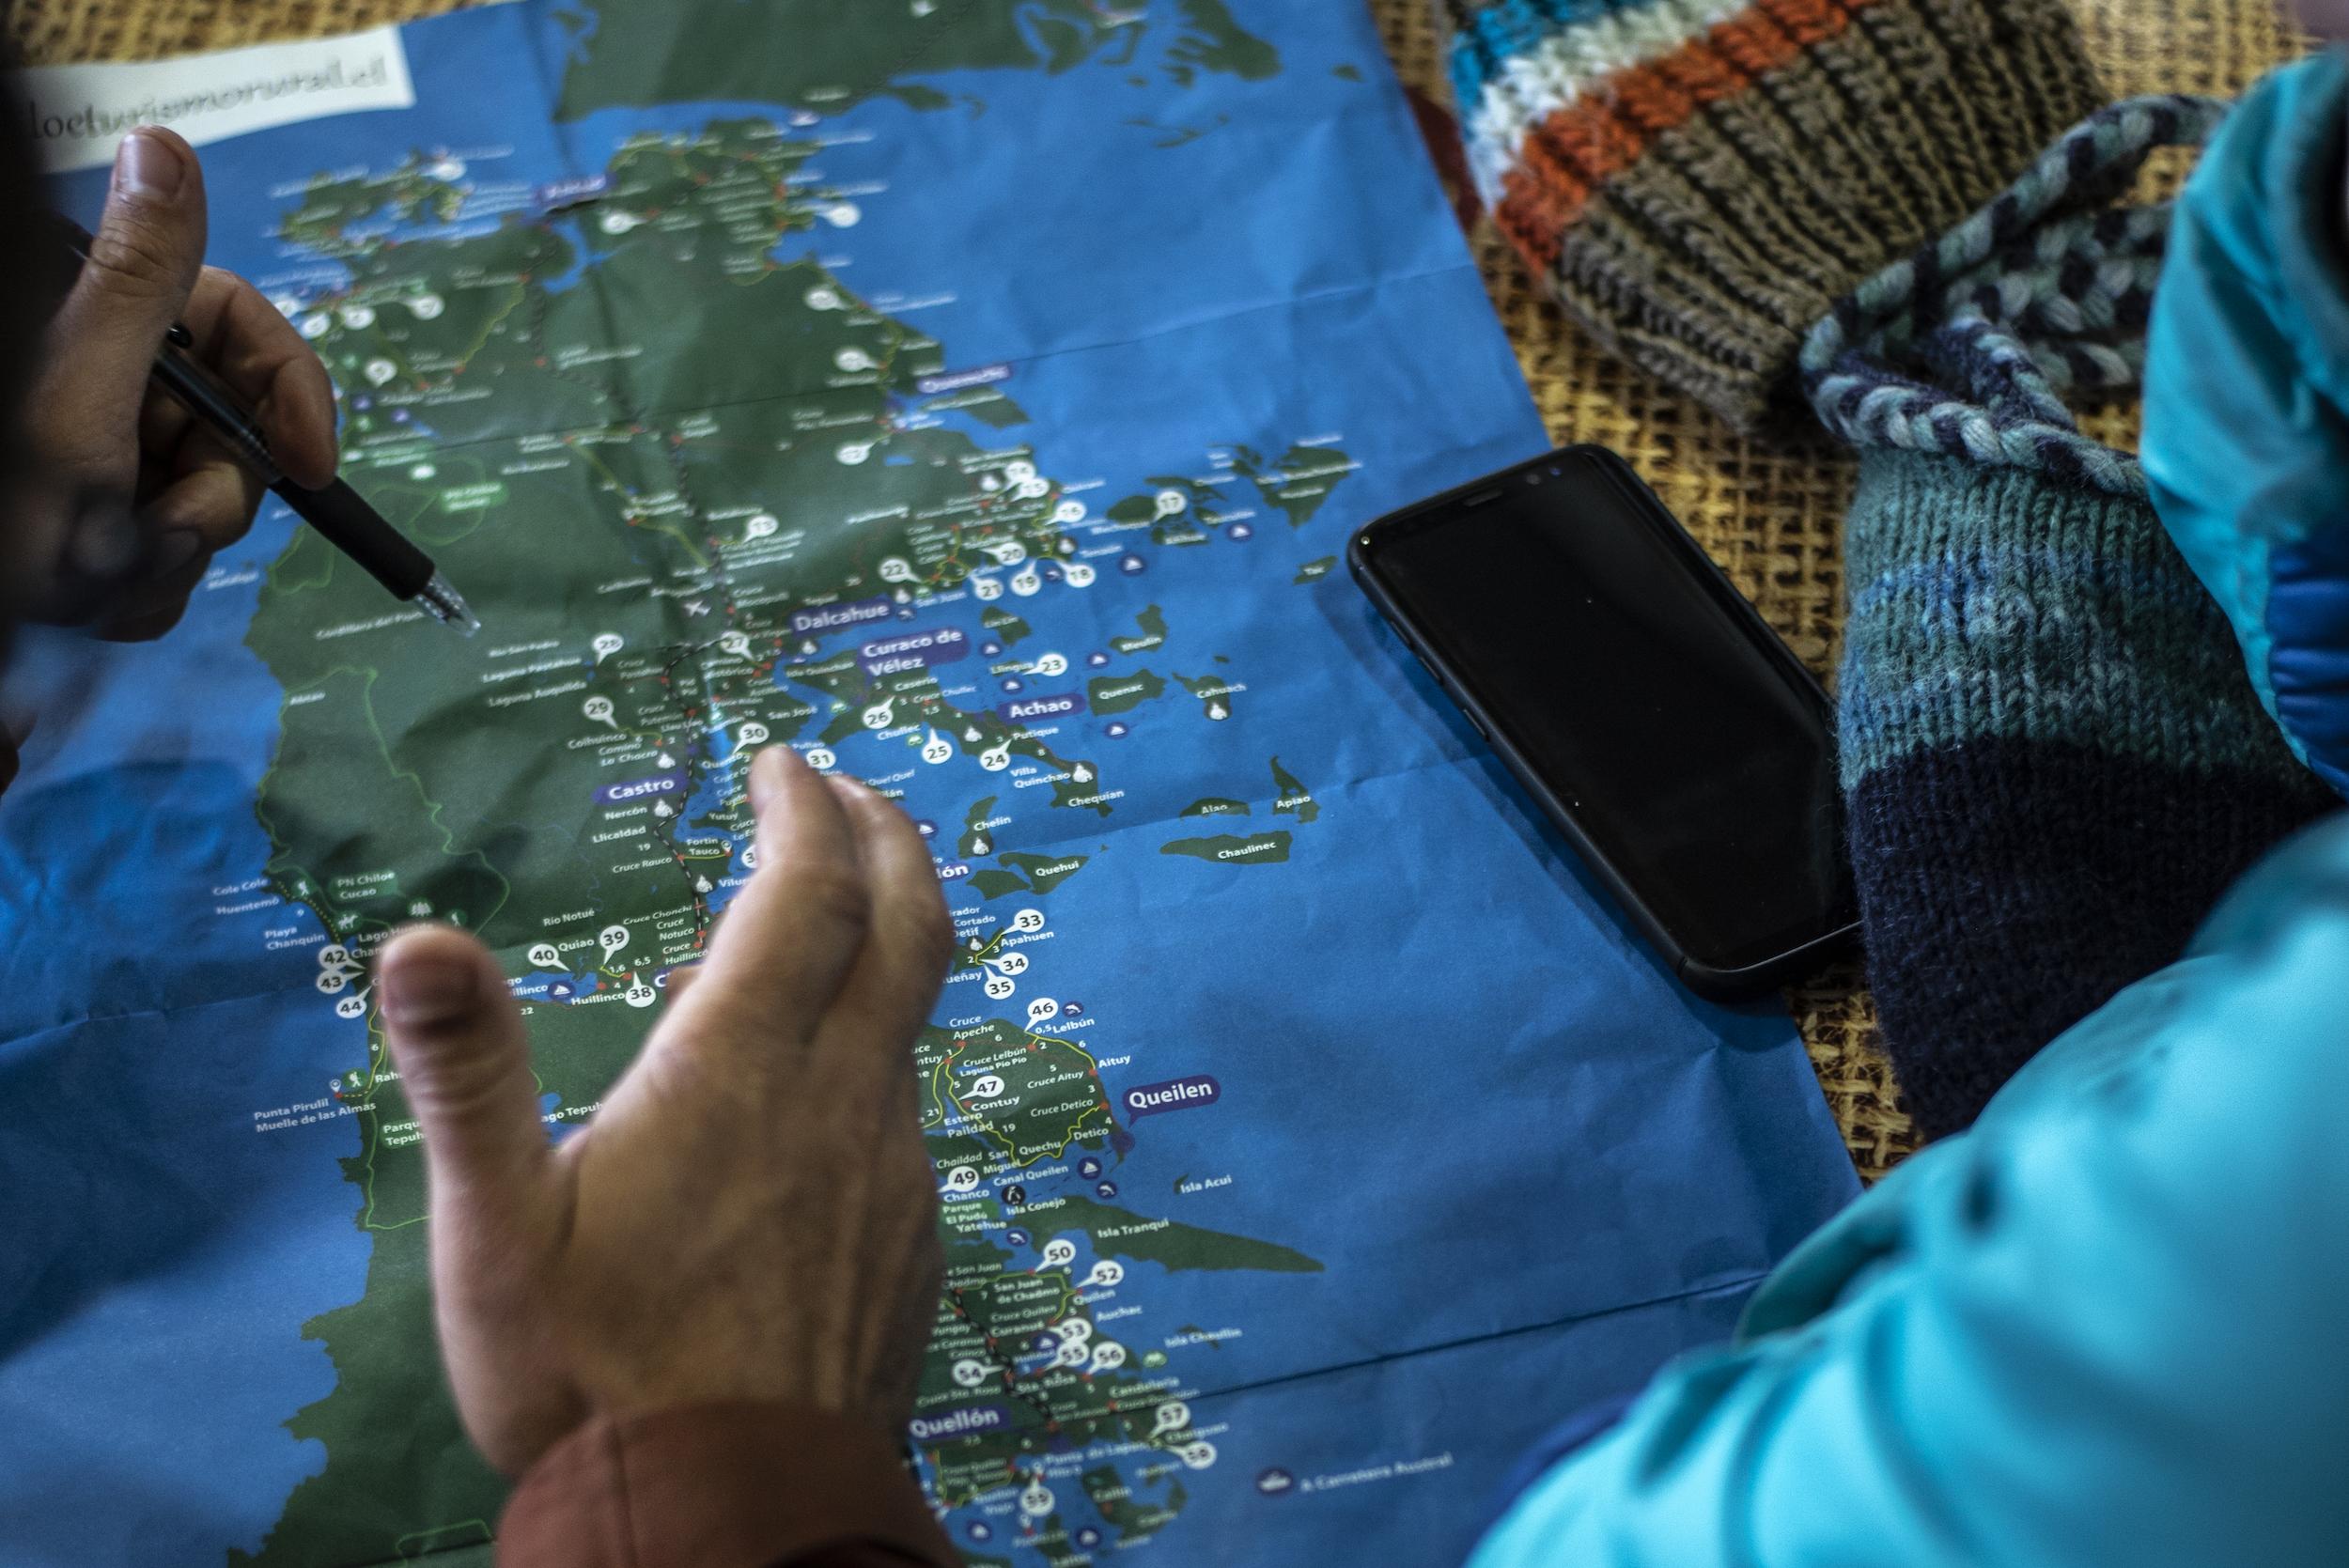 Chile map.jpg